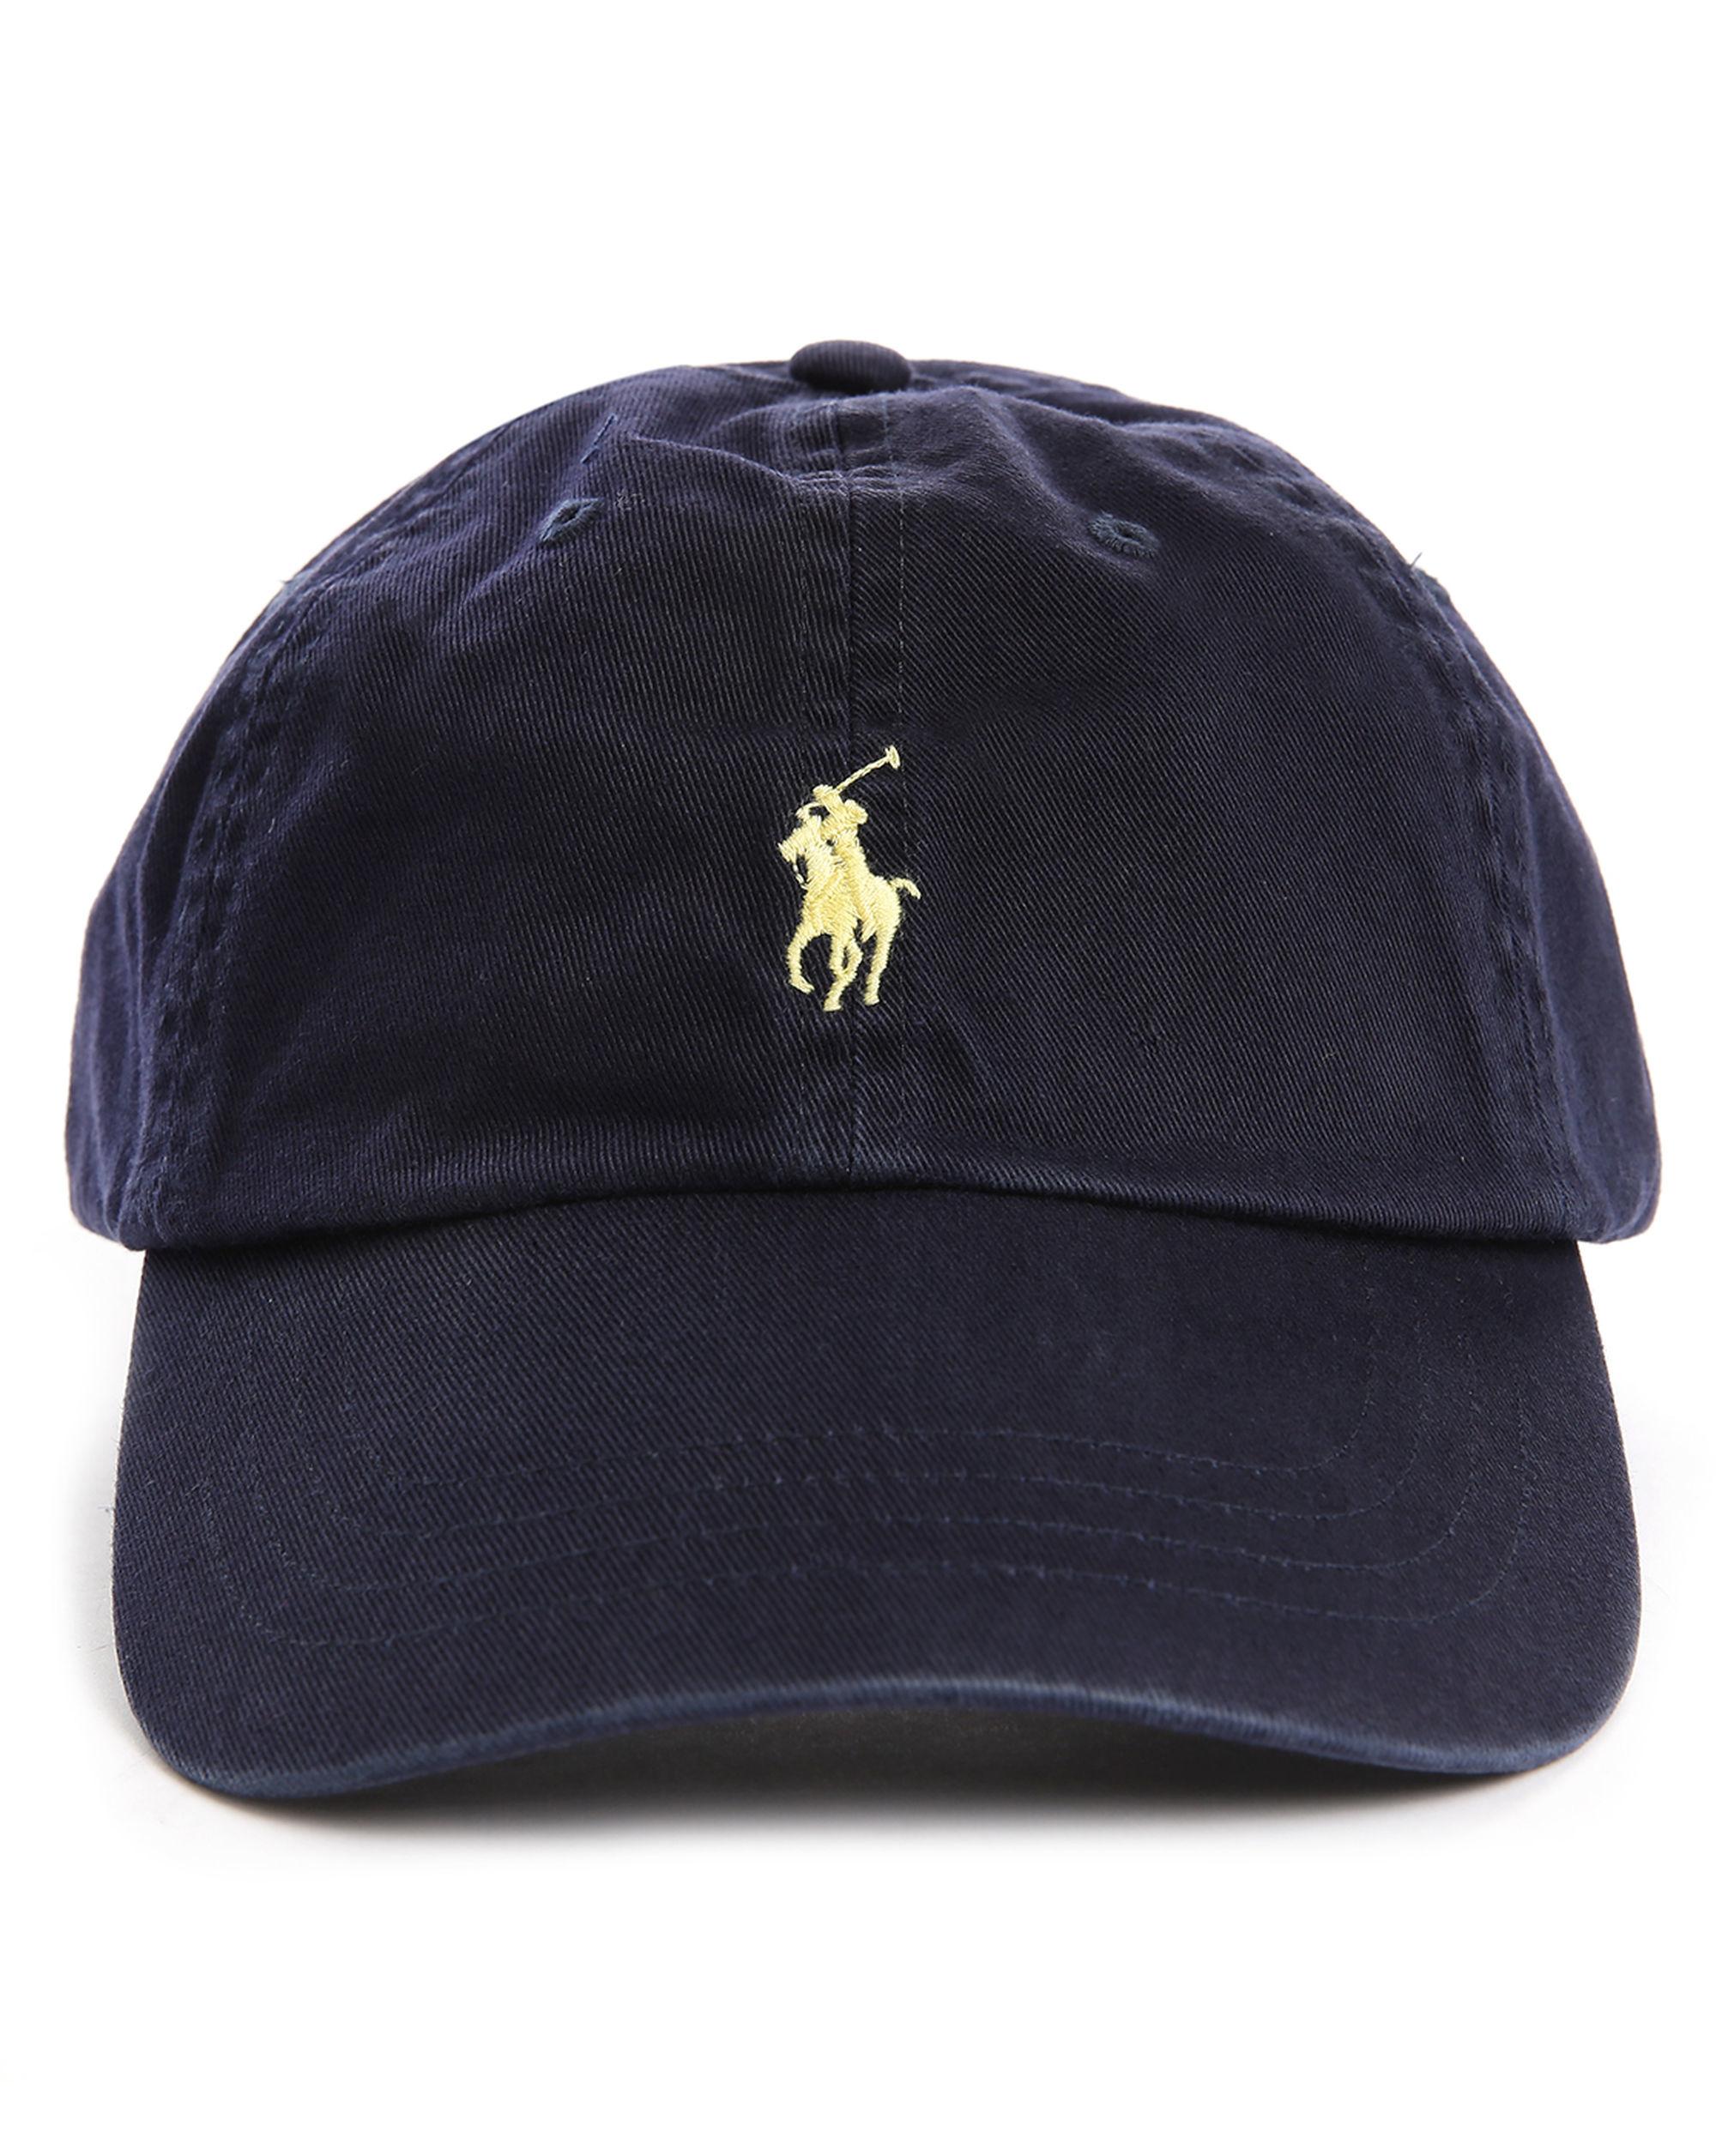 polo ralph lauren logo embroidered cotton cap in blue for men lyst. Black Bedroom Furniture Sets. Home Design Ideas